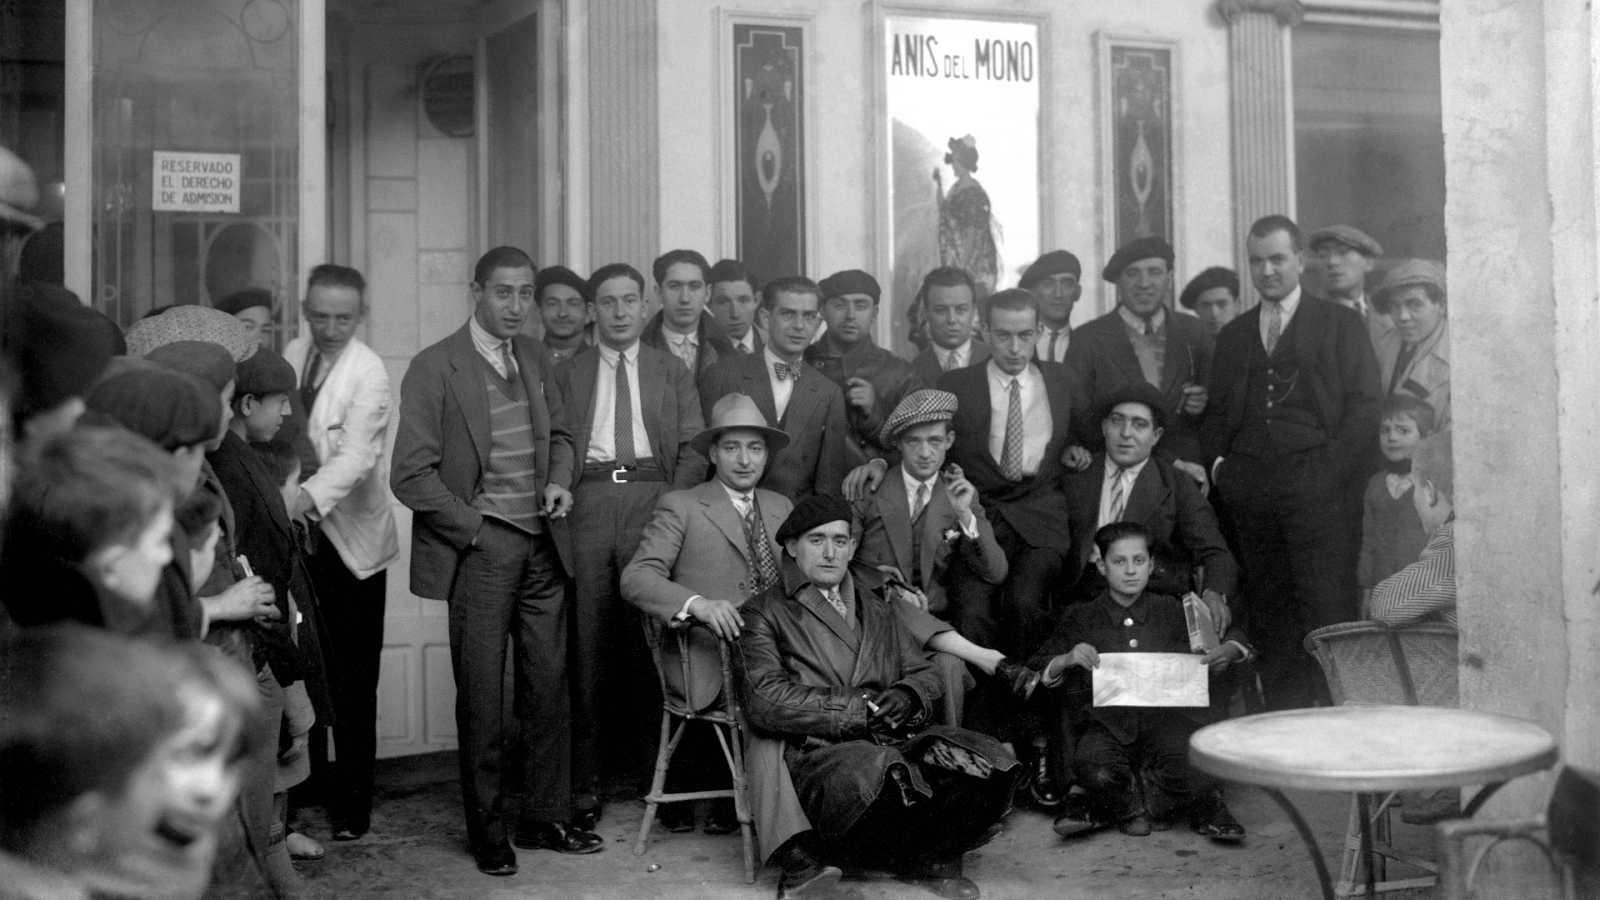 El artista aragonés Ramón Acín donó 50.000 pesetas de la Lotería de Navidad a Buñuel